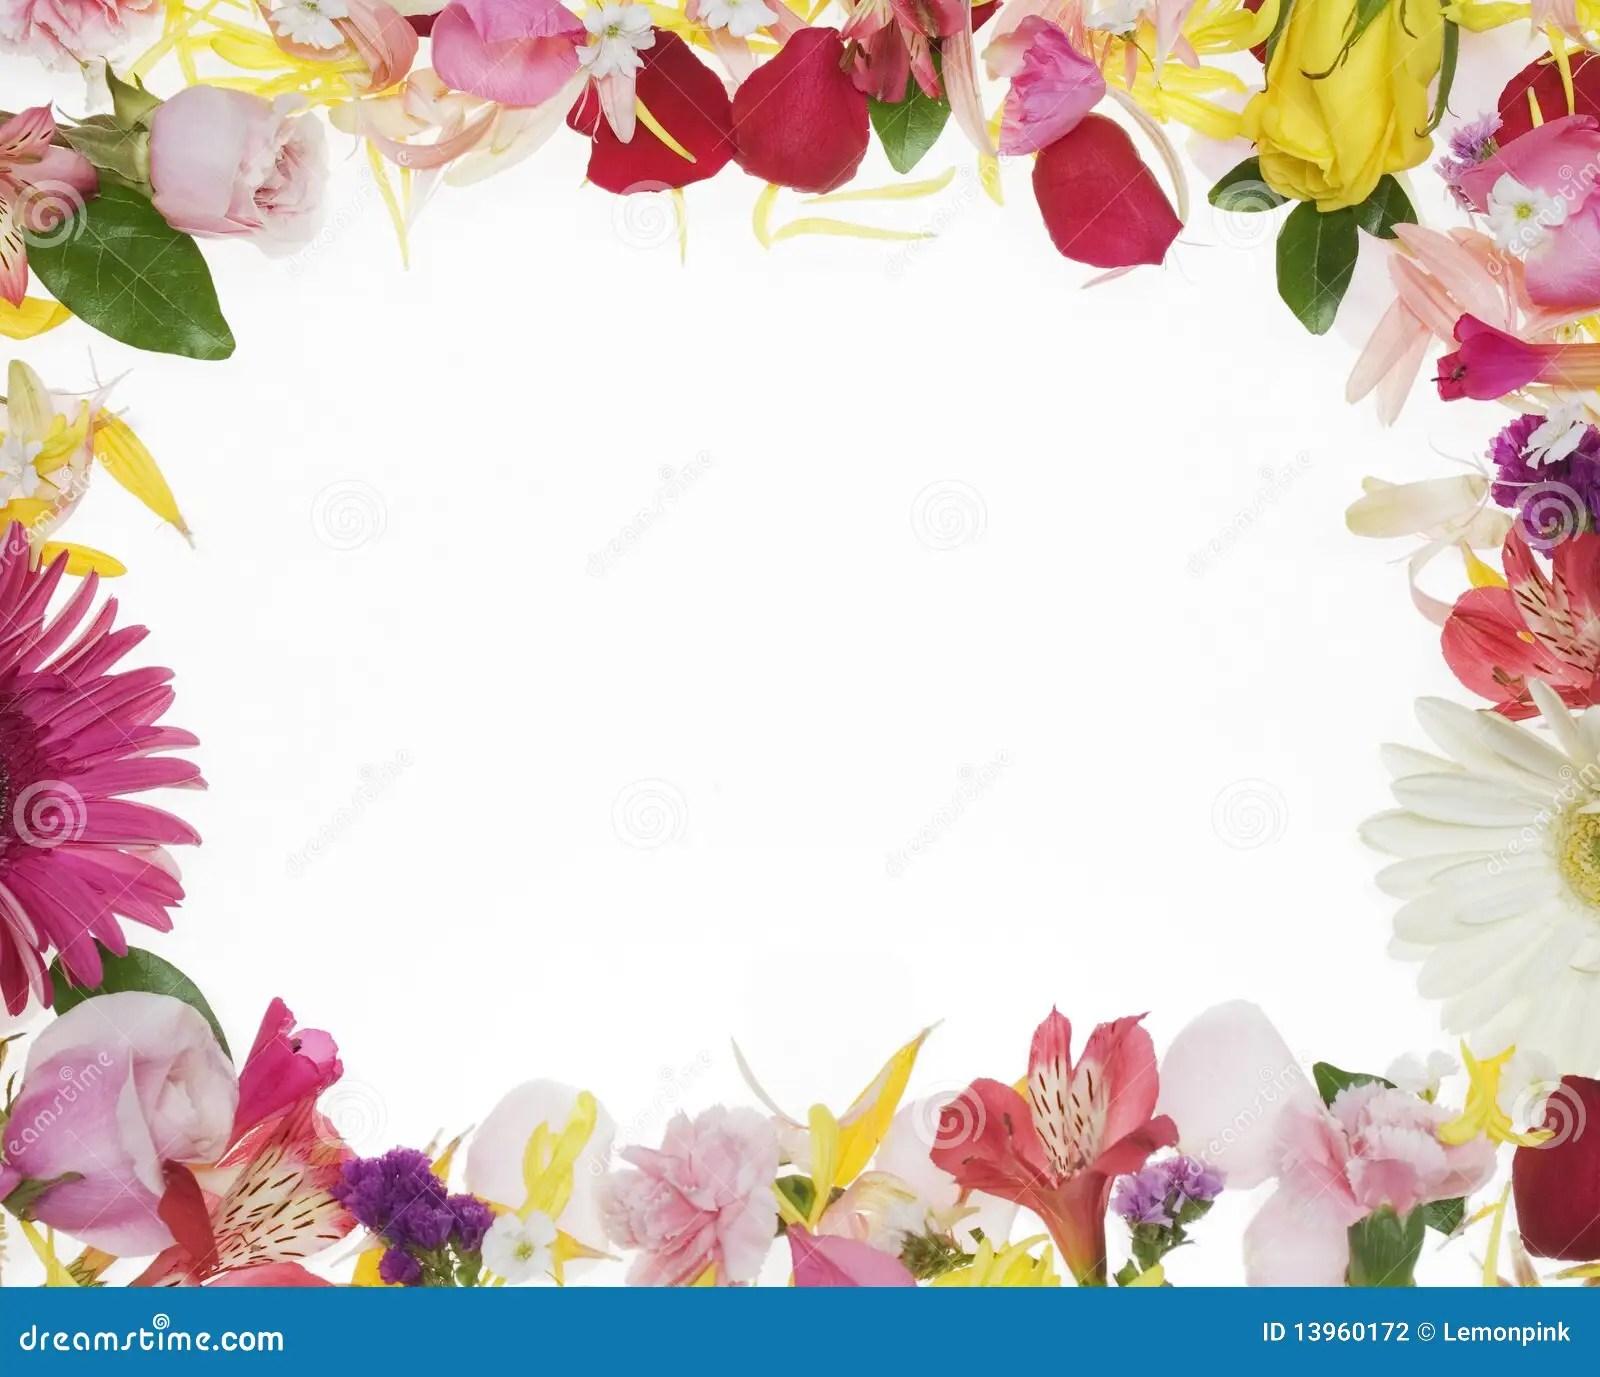 Flower Border Stock Photo Image Of Yellow Background